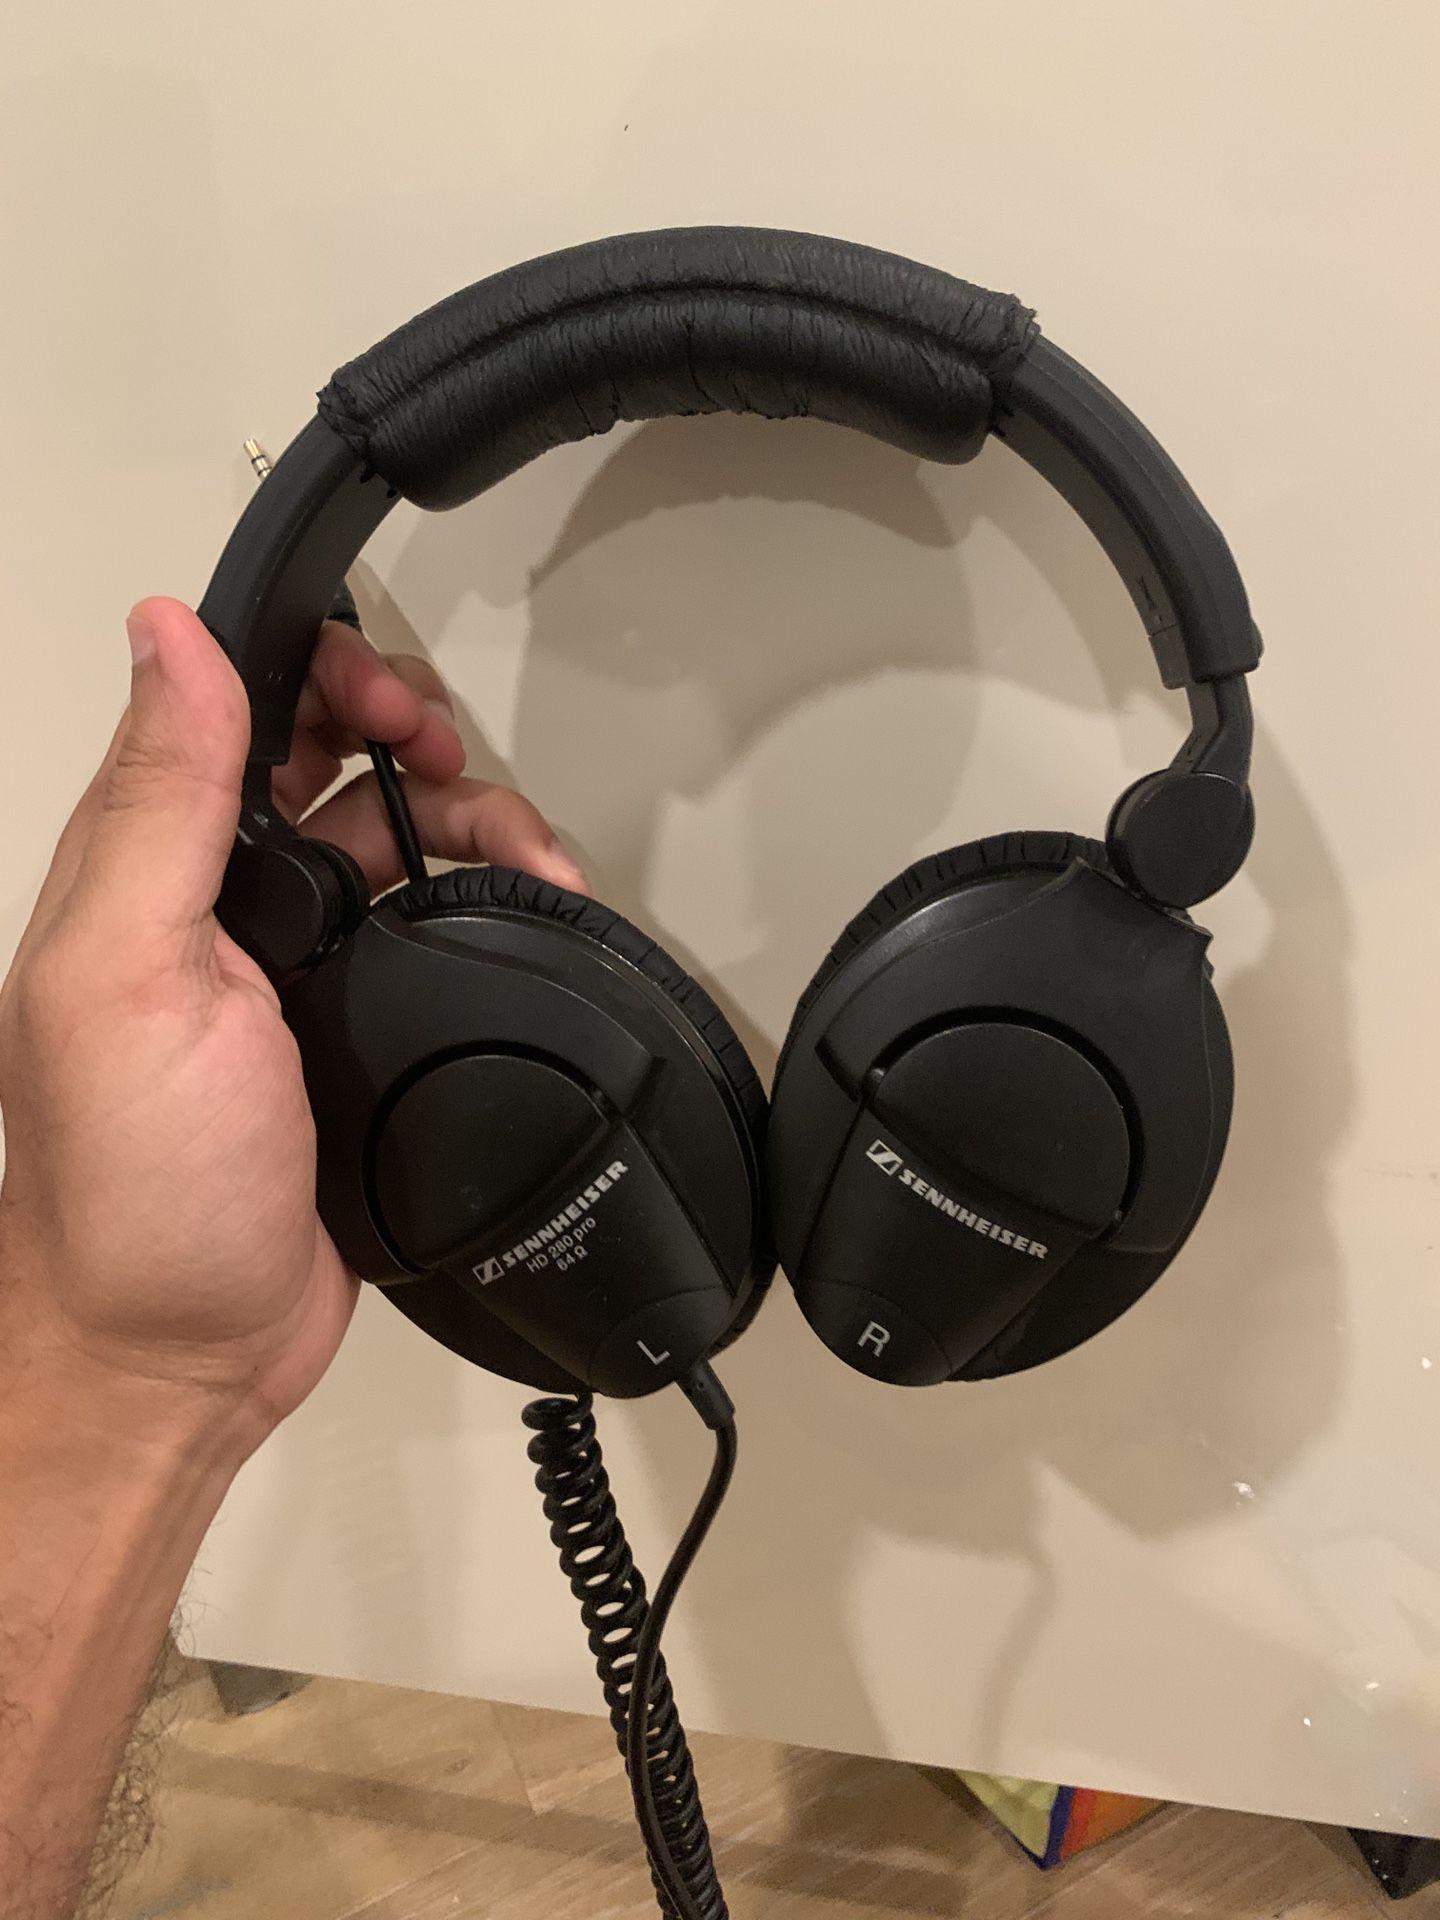 Sennheiser Headphones - HD 280 Pro